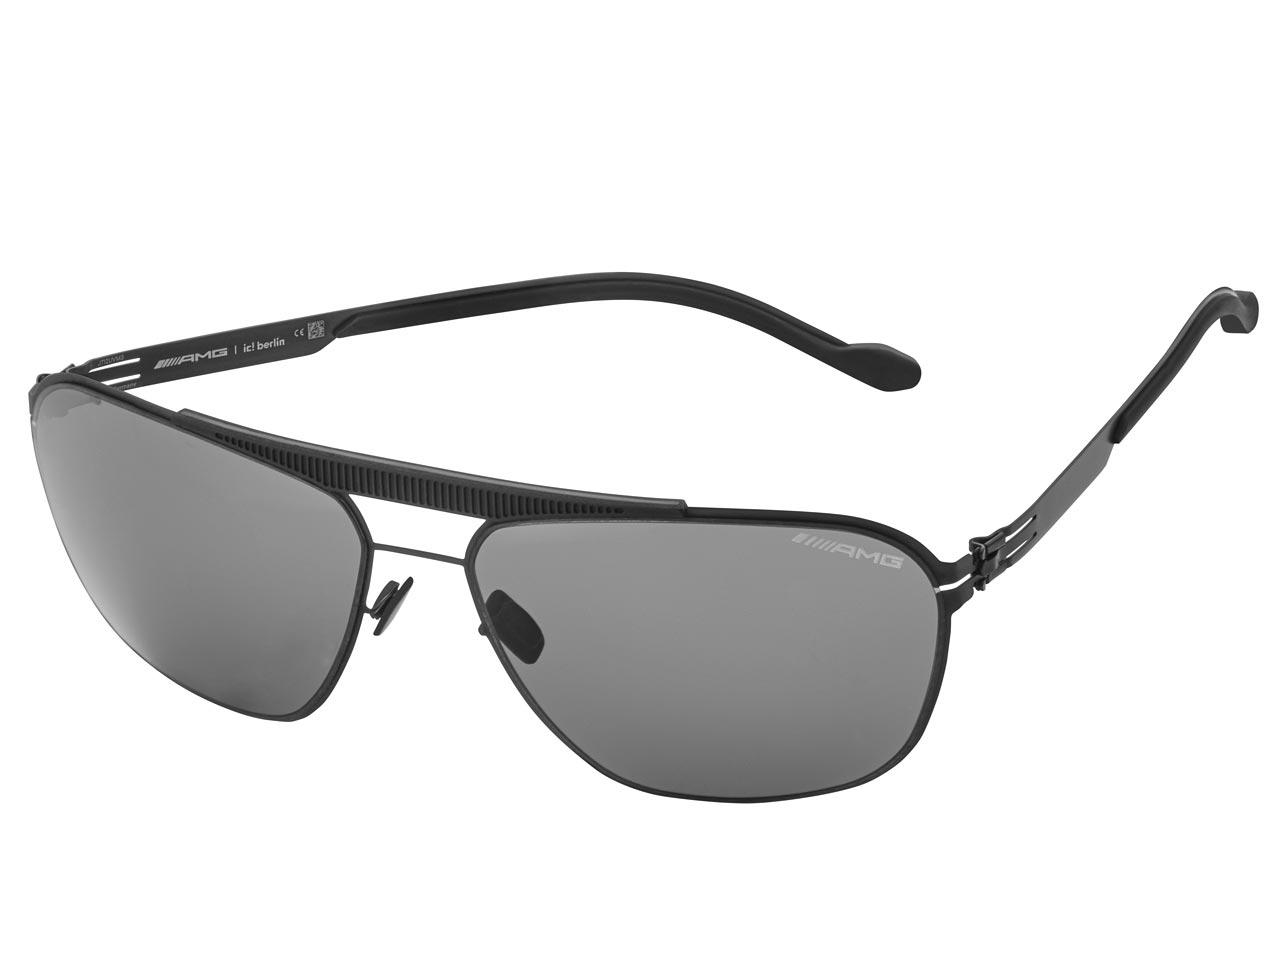 Mercedes-Benz AMG Business men's sunglasses - B66955820   Mercedes-Benz Classic Store